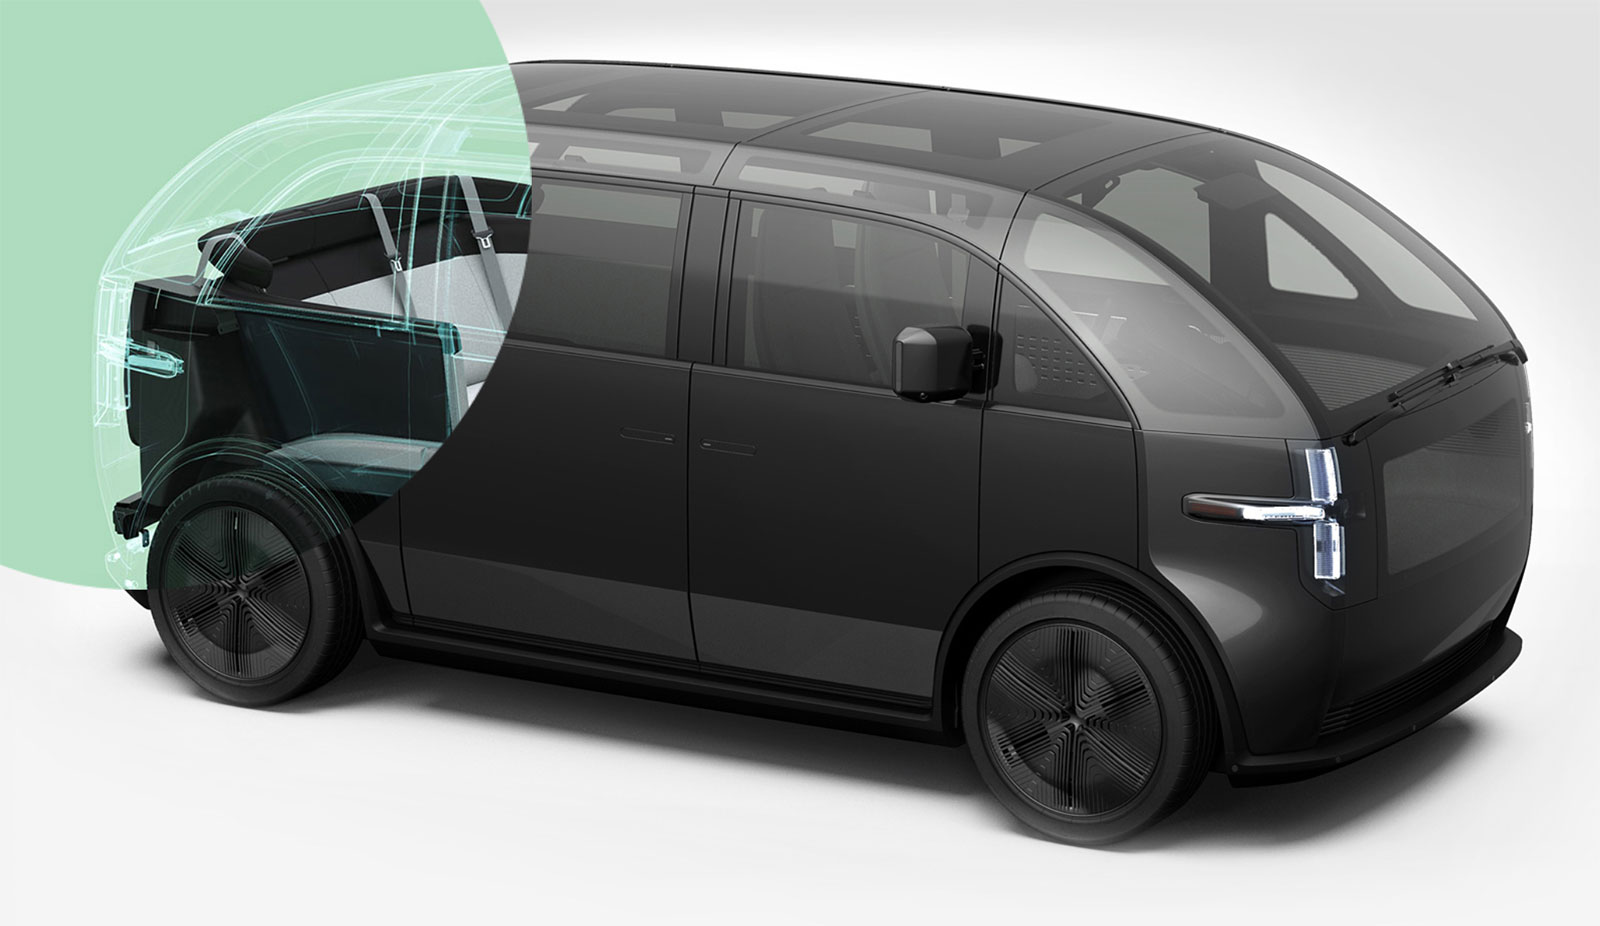 Diseño de vehículo de Canoo